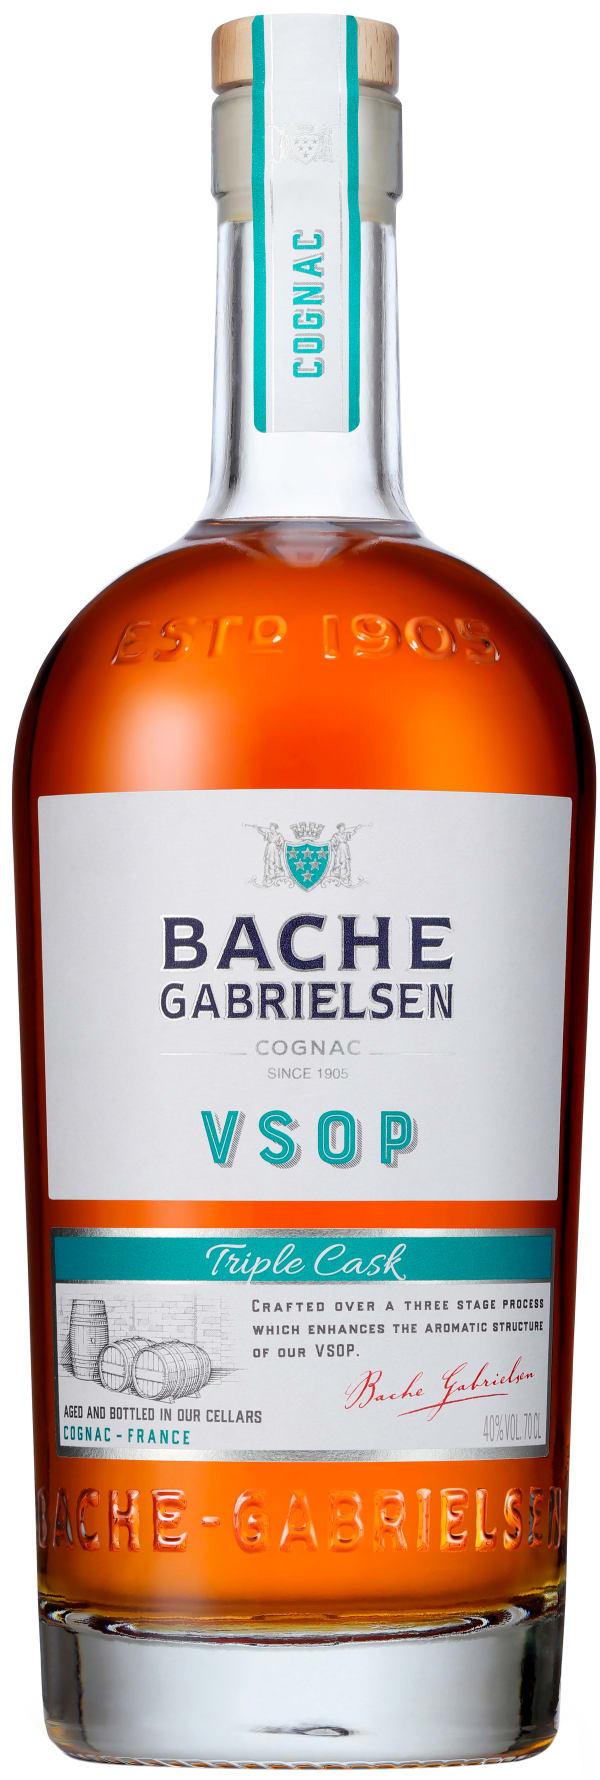 Bache Gabrielsen Triple Cask VSOP